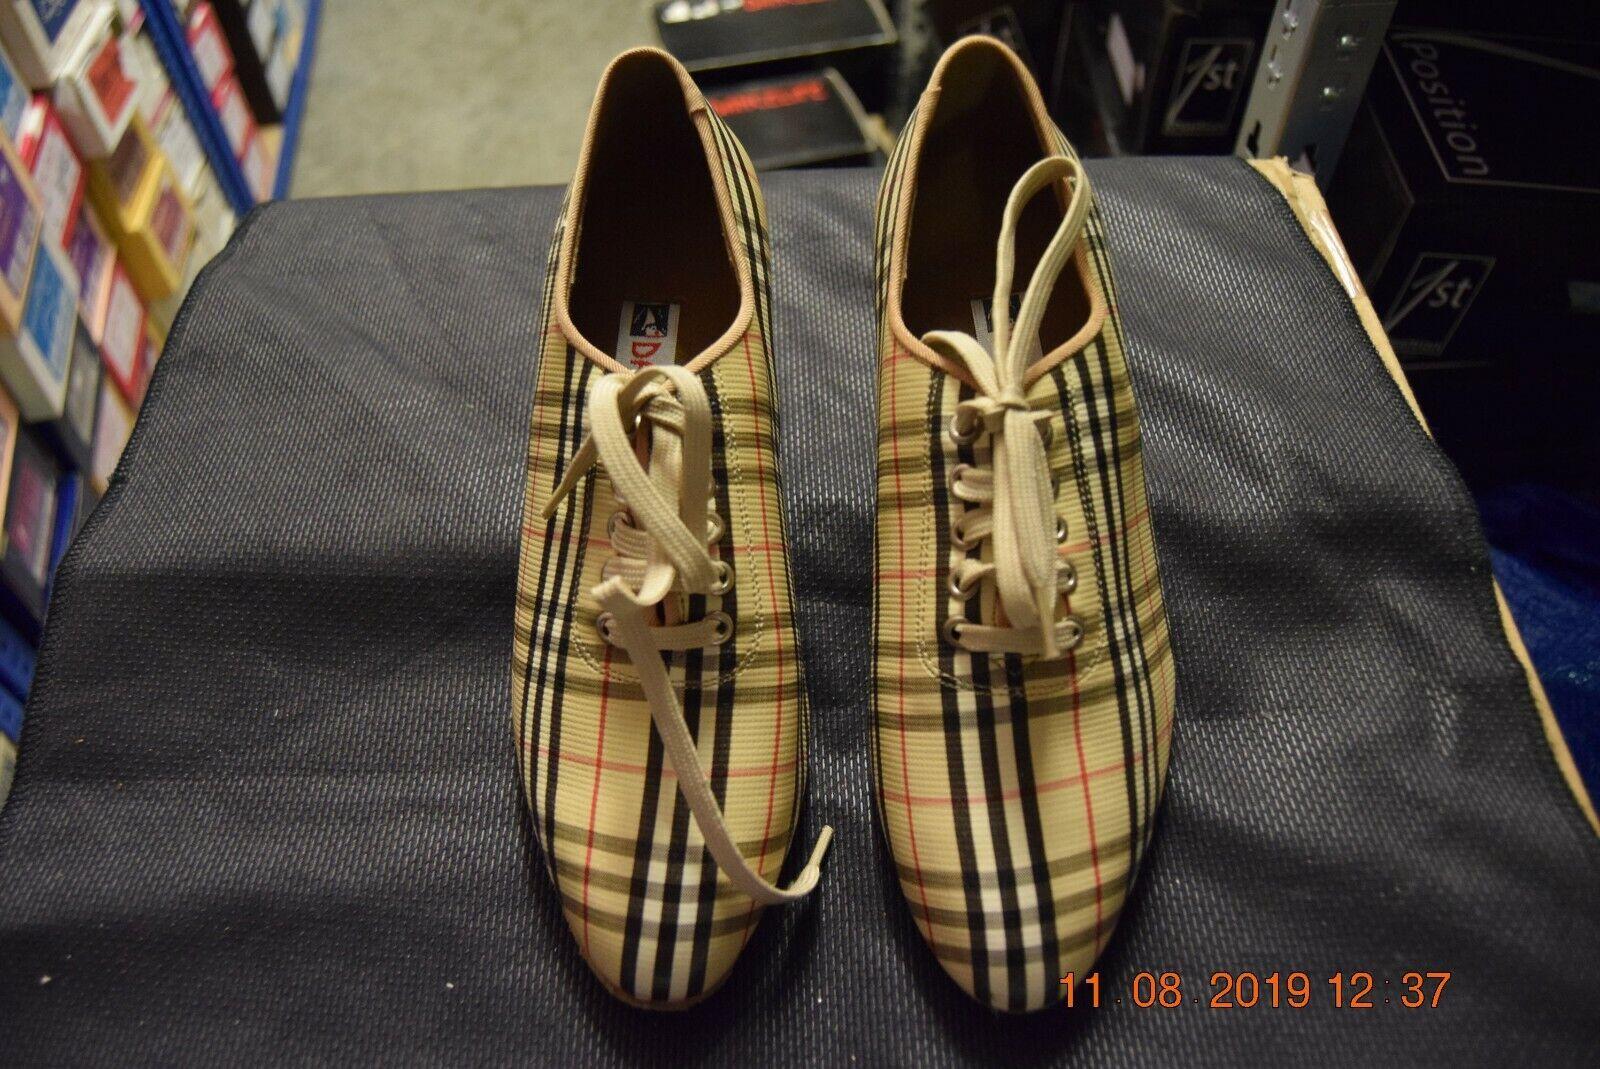 Tartan oxford dancelife 49590 ballroom / latin dance shoes - size UK 3.5